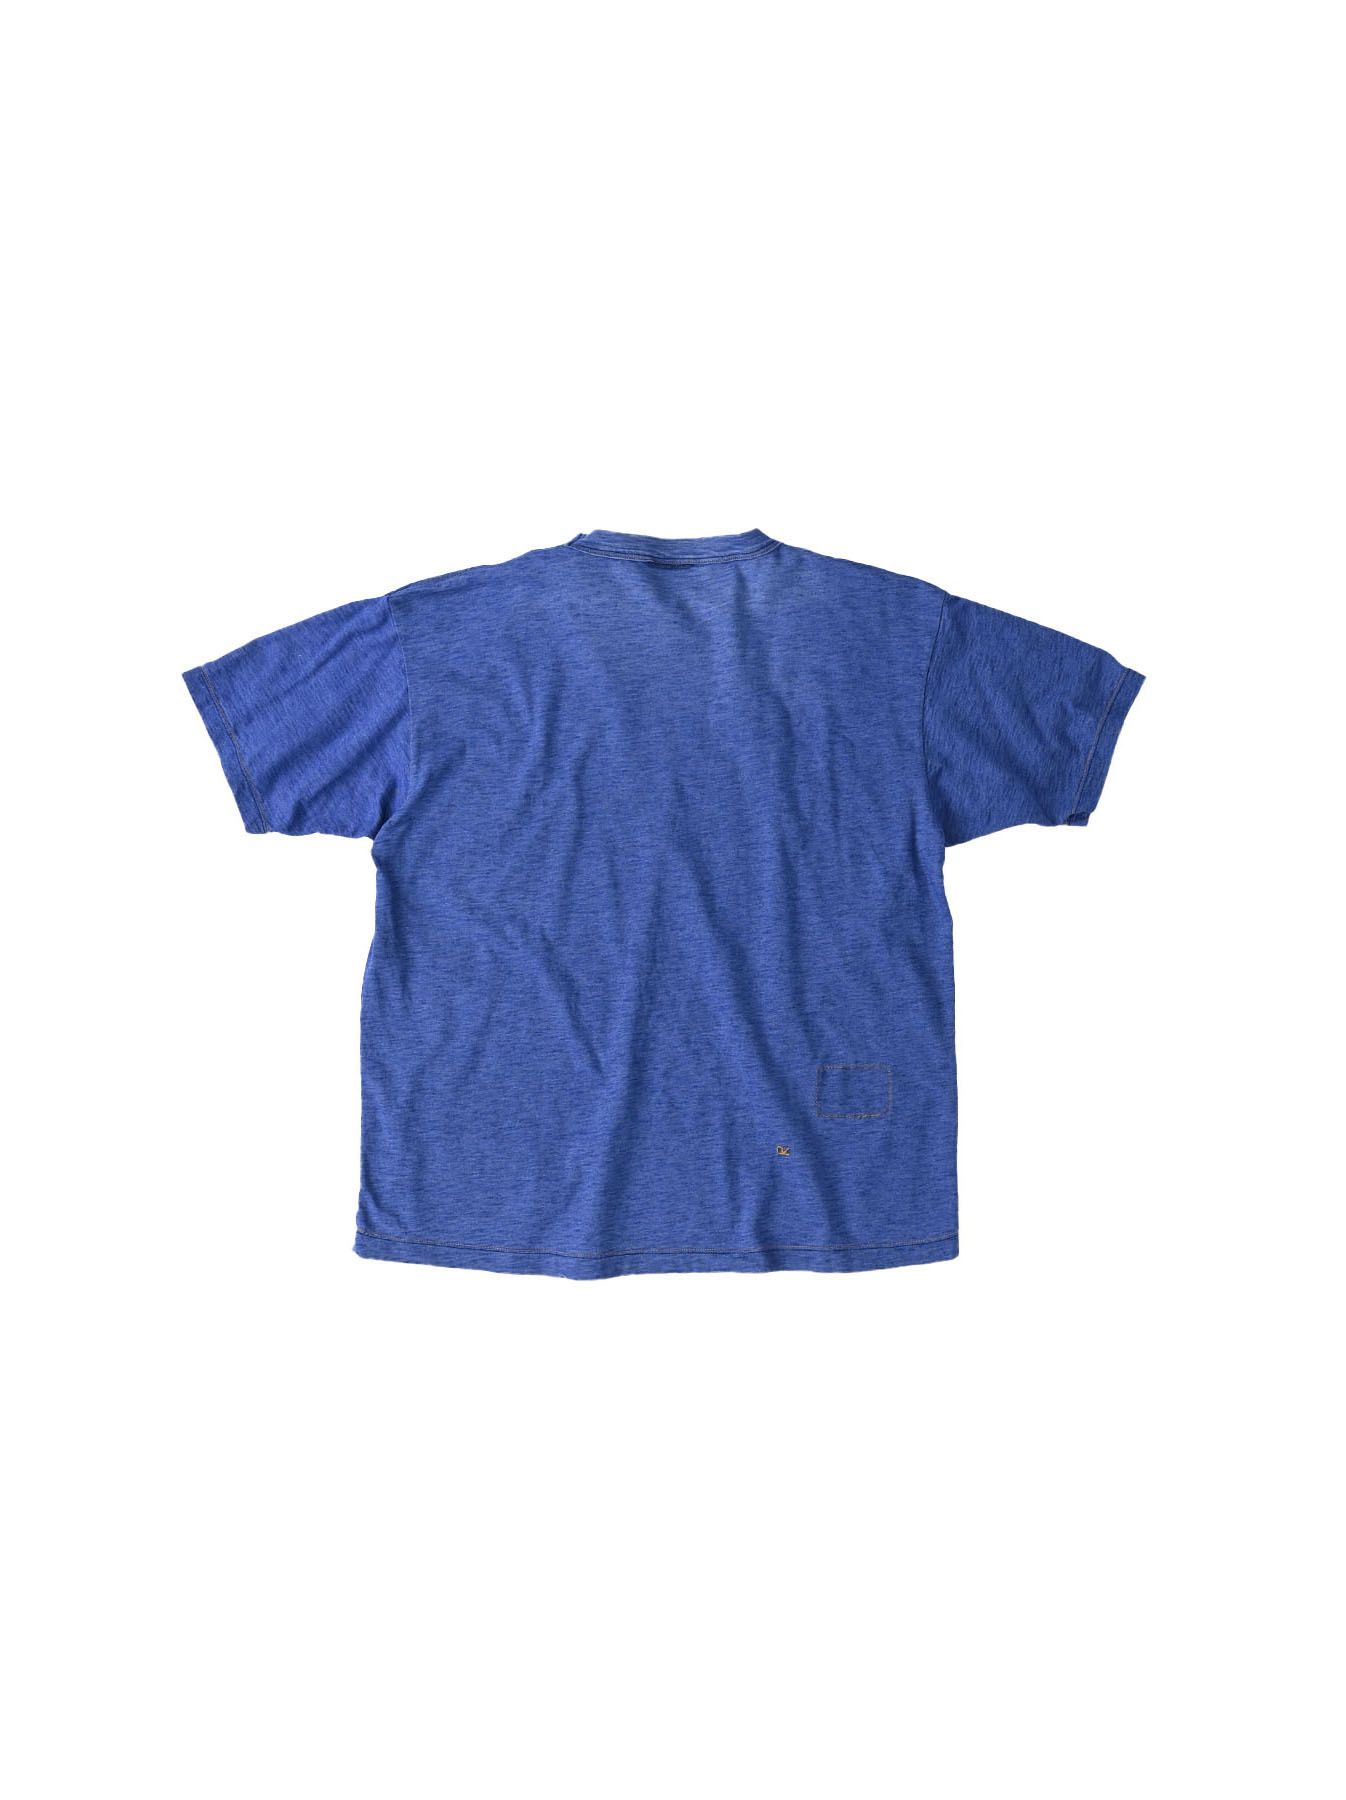 Distressed Indigo Tenjiku 908 Ocean T-Shirt (0621)-6